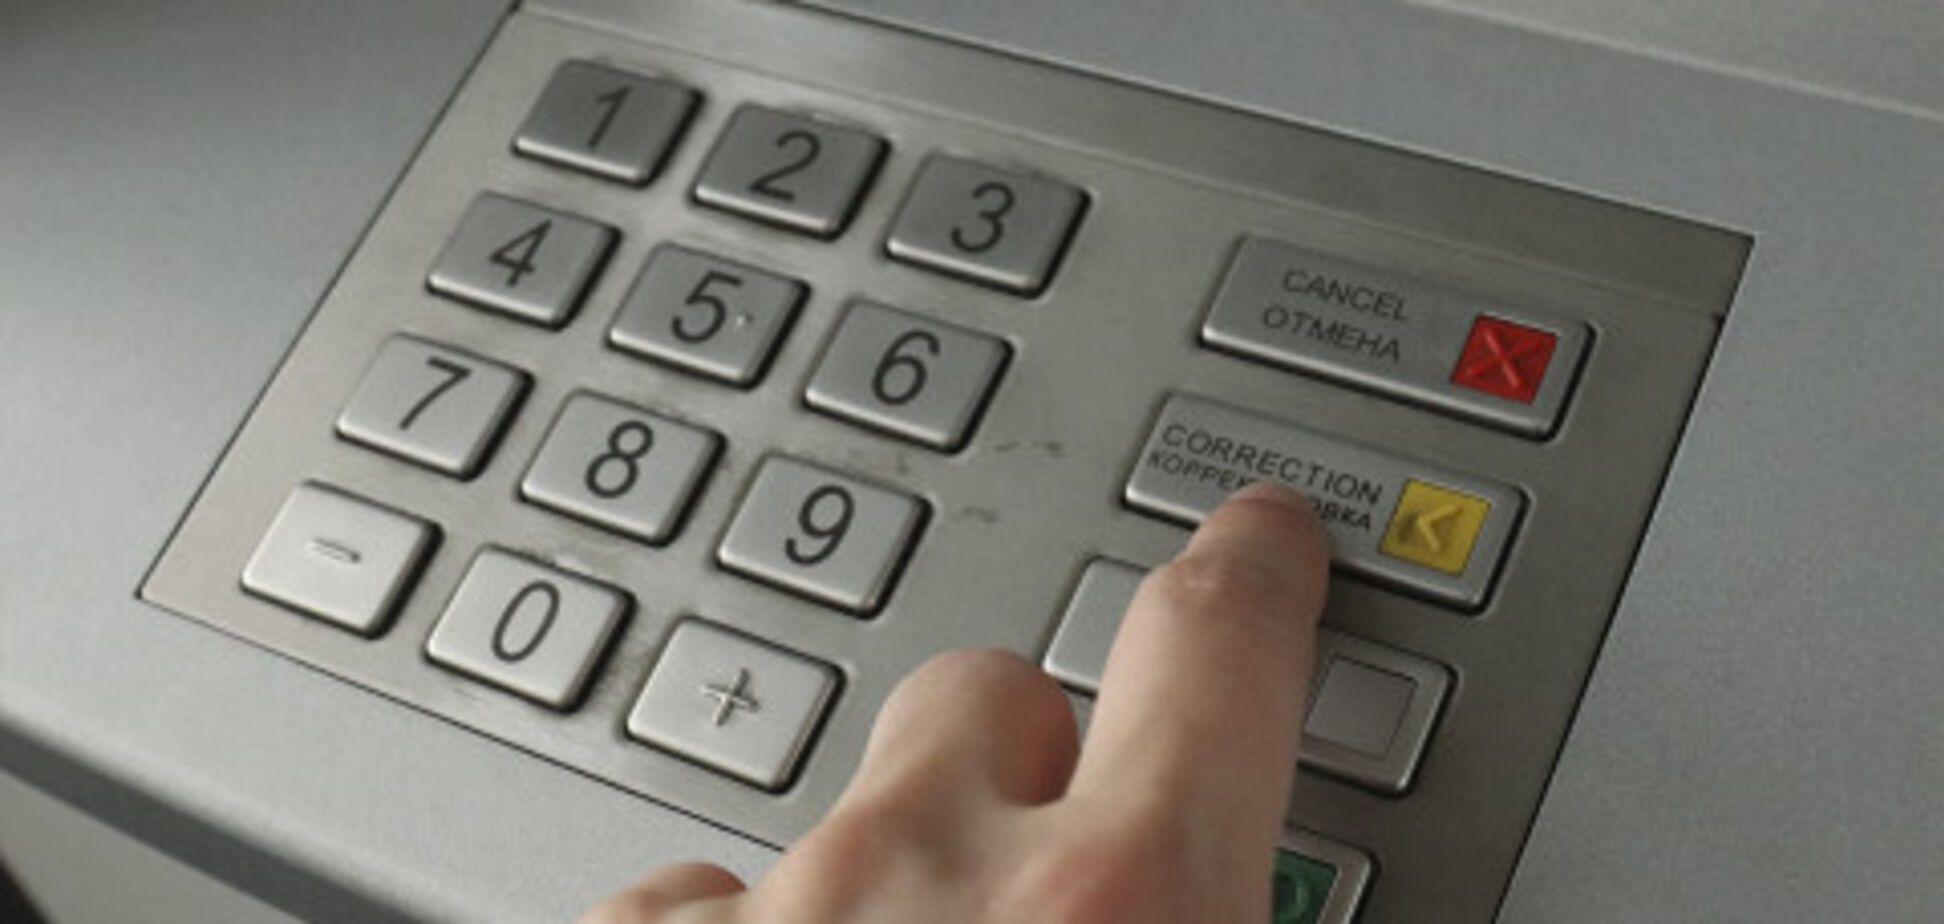 В центре Киева мужчина напал на женщину у банкомата и ограбил на 15 тыс. грн